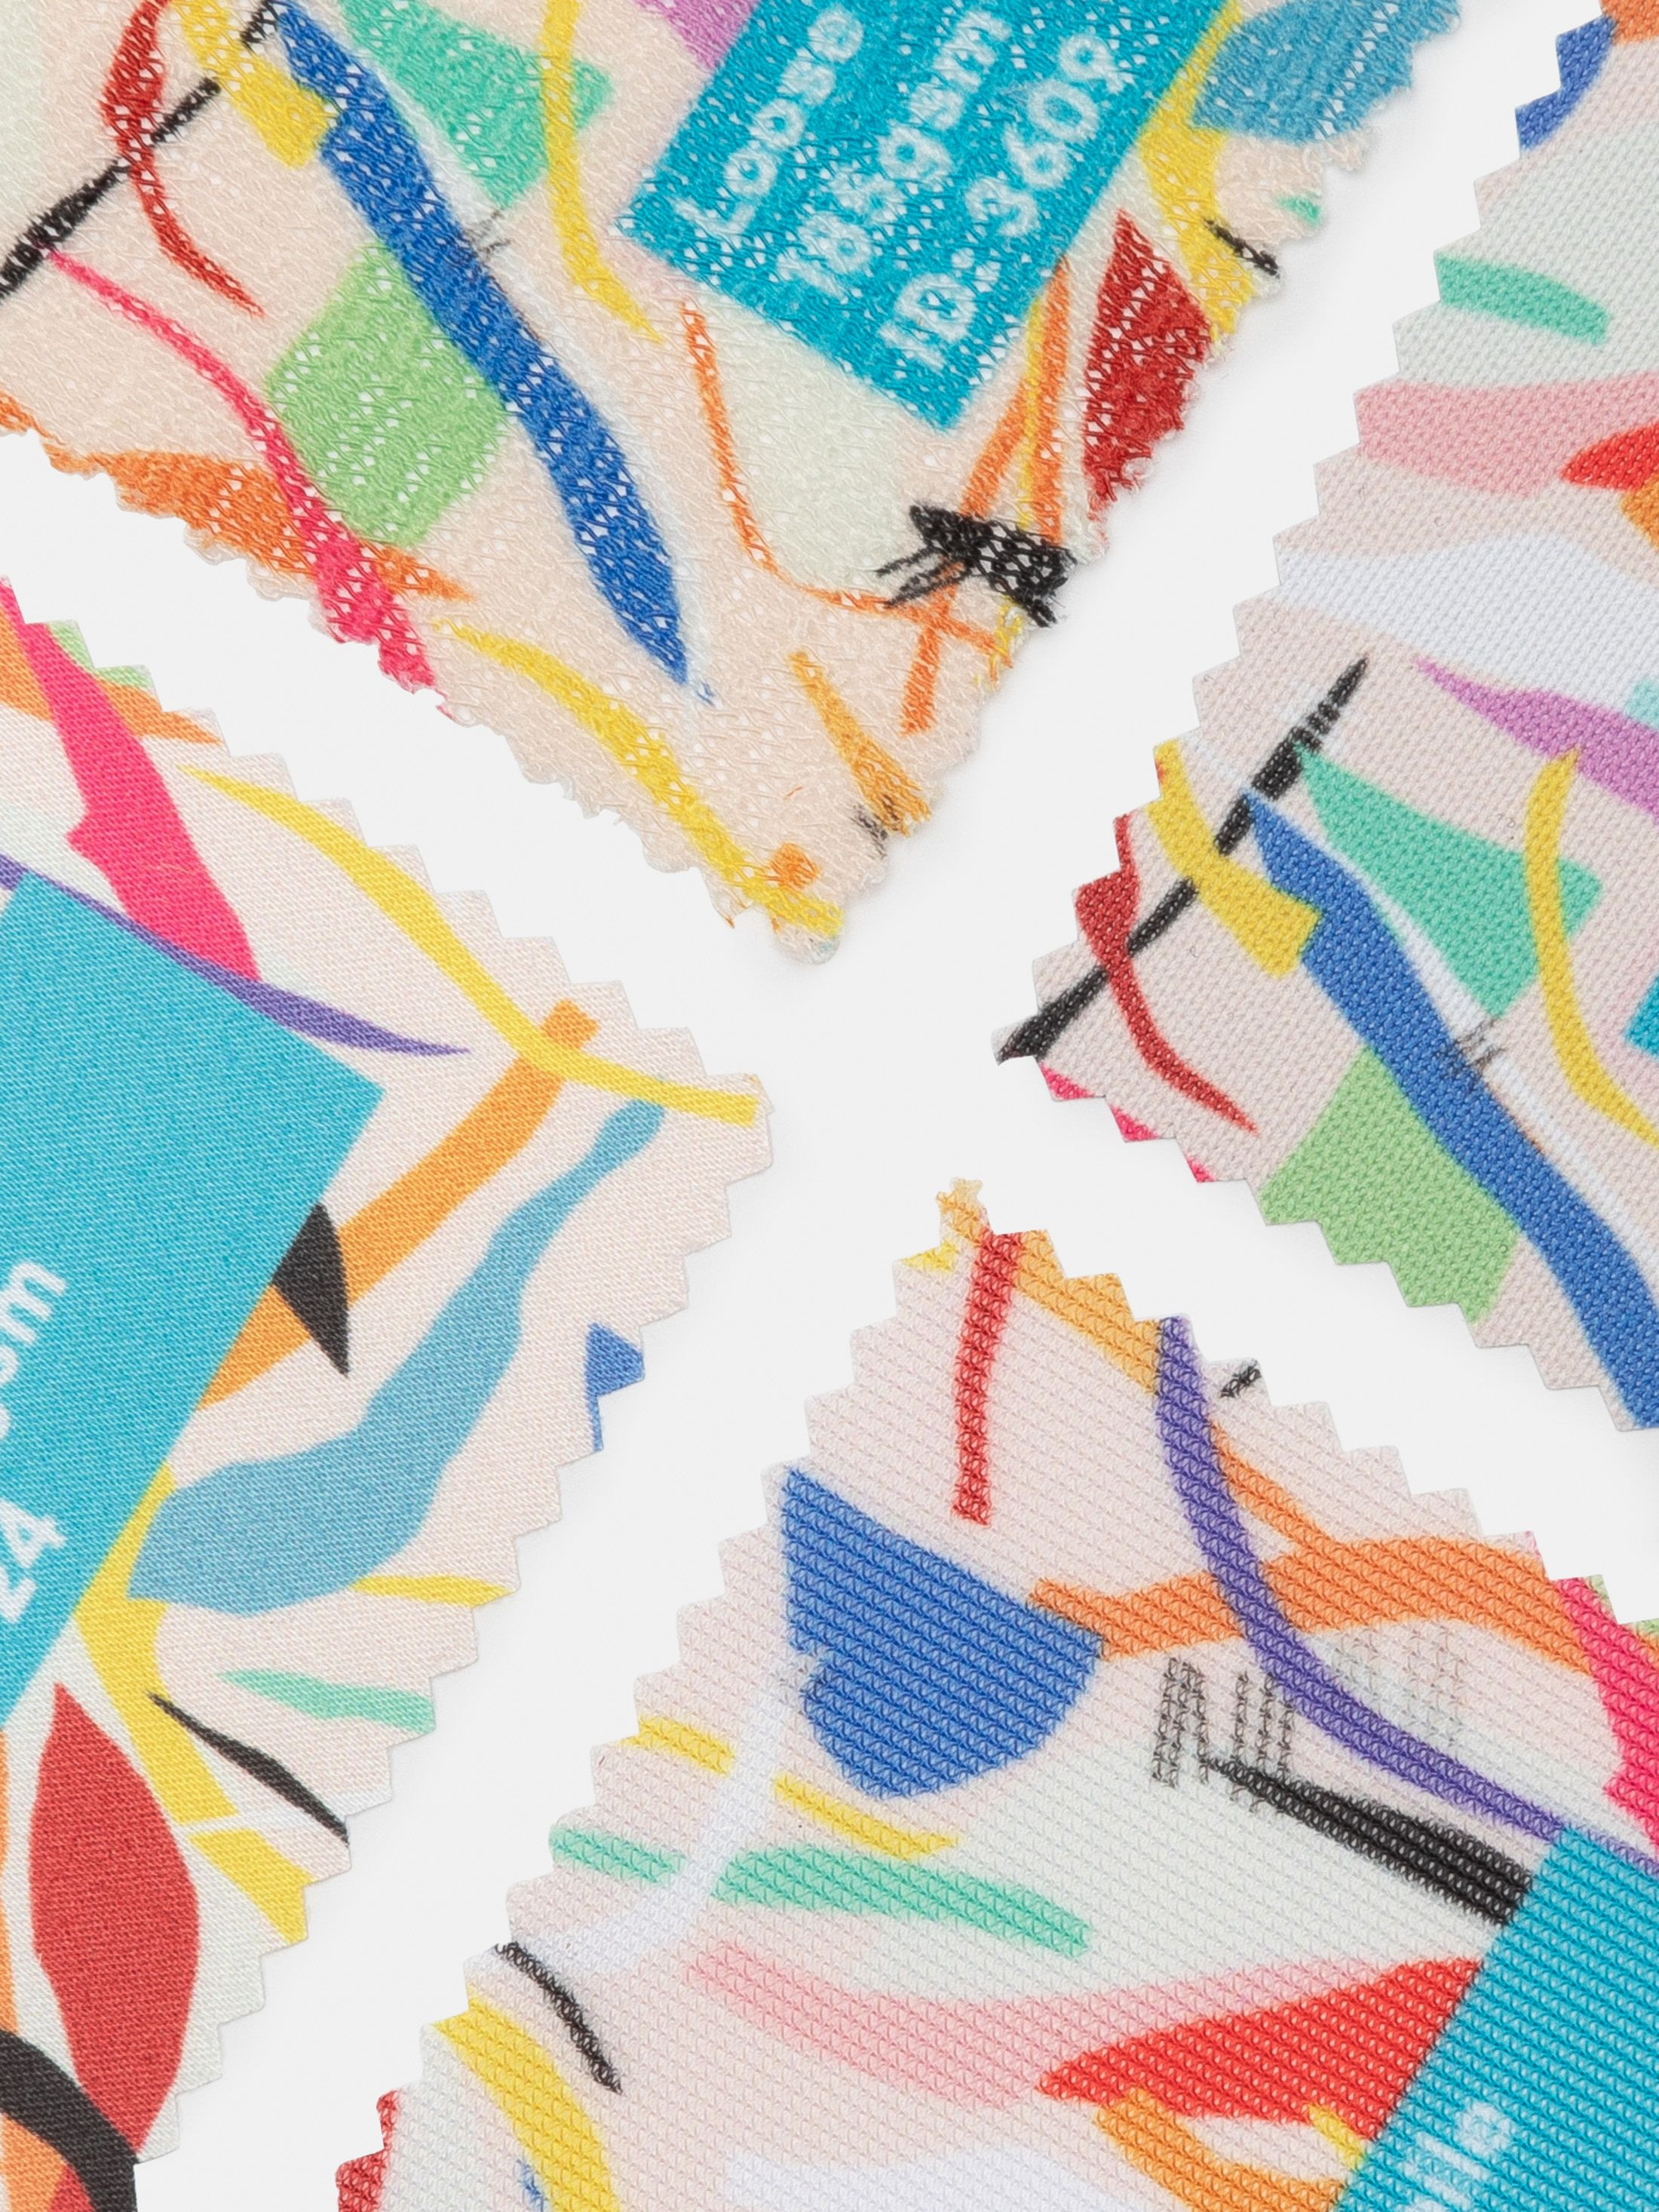 fabric swatch packs au